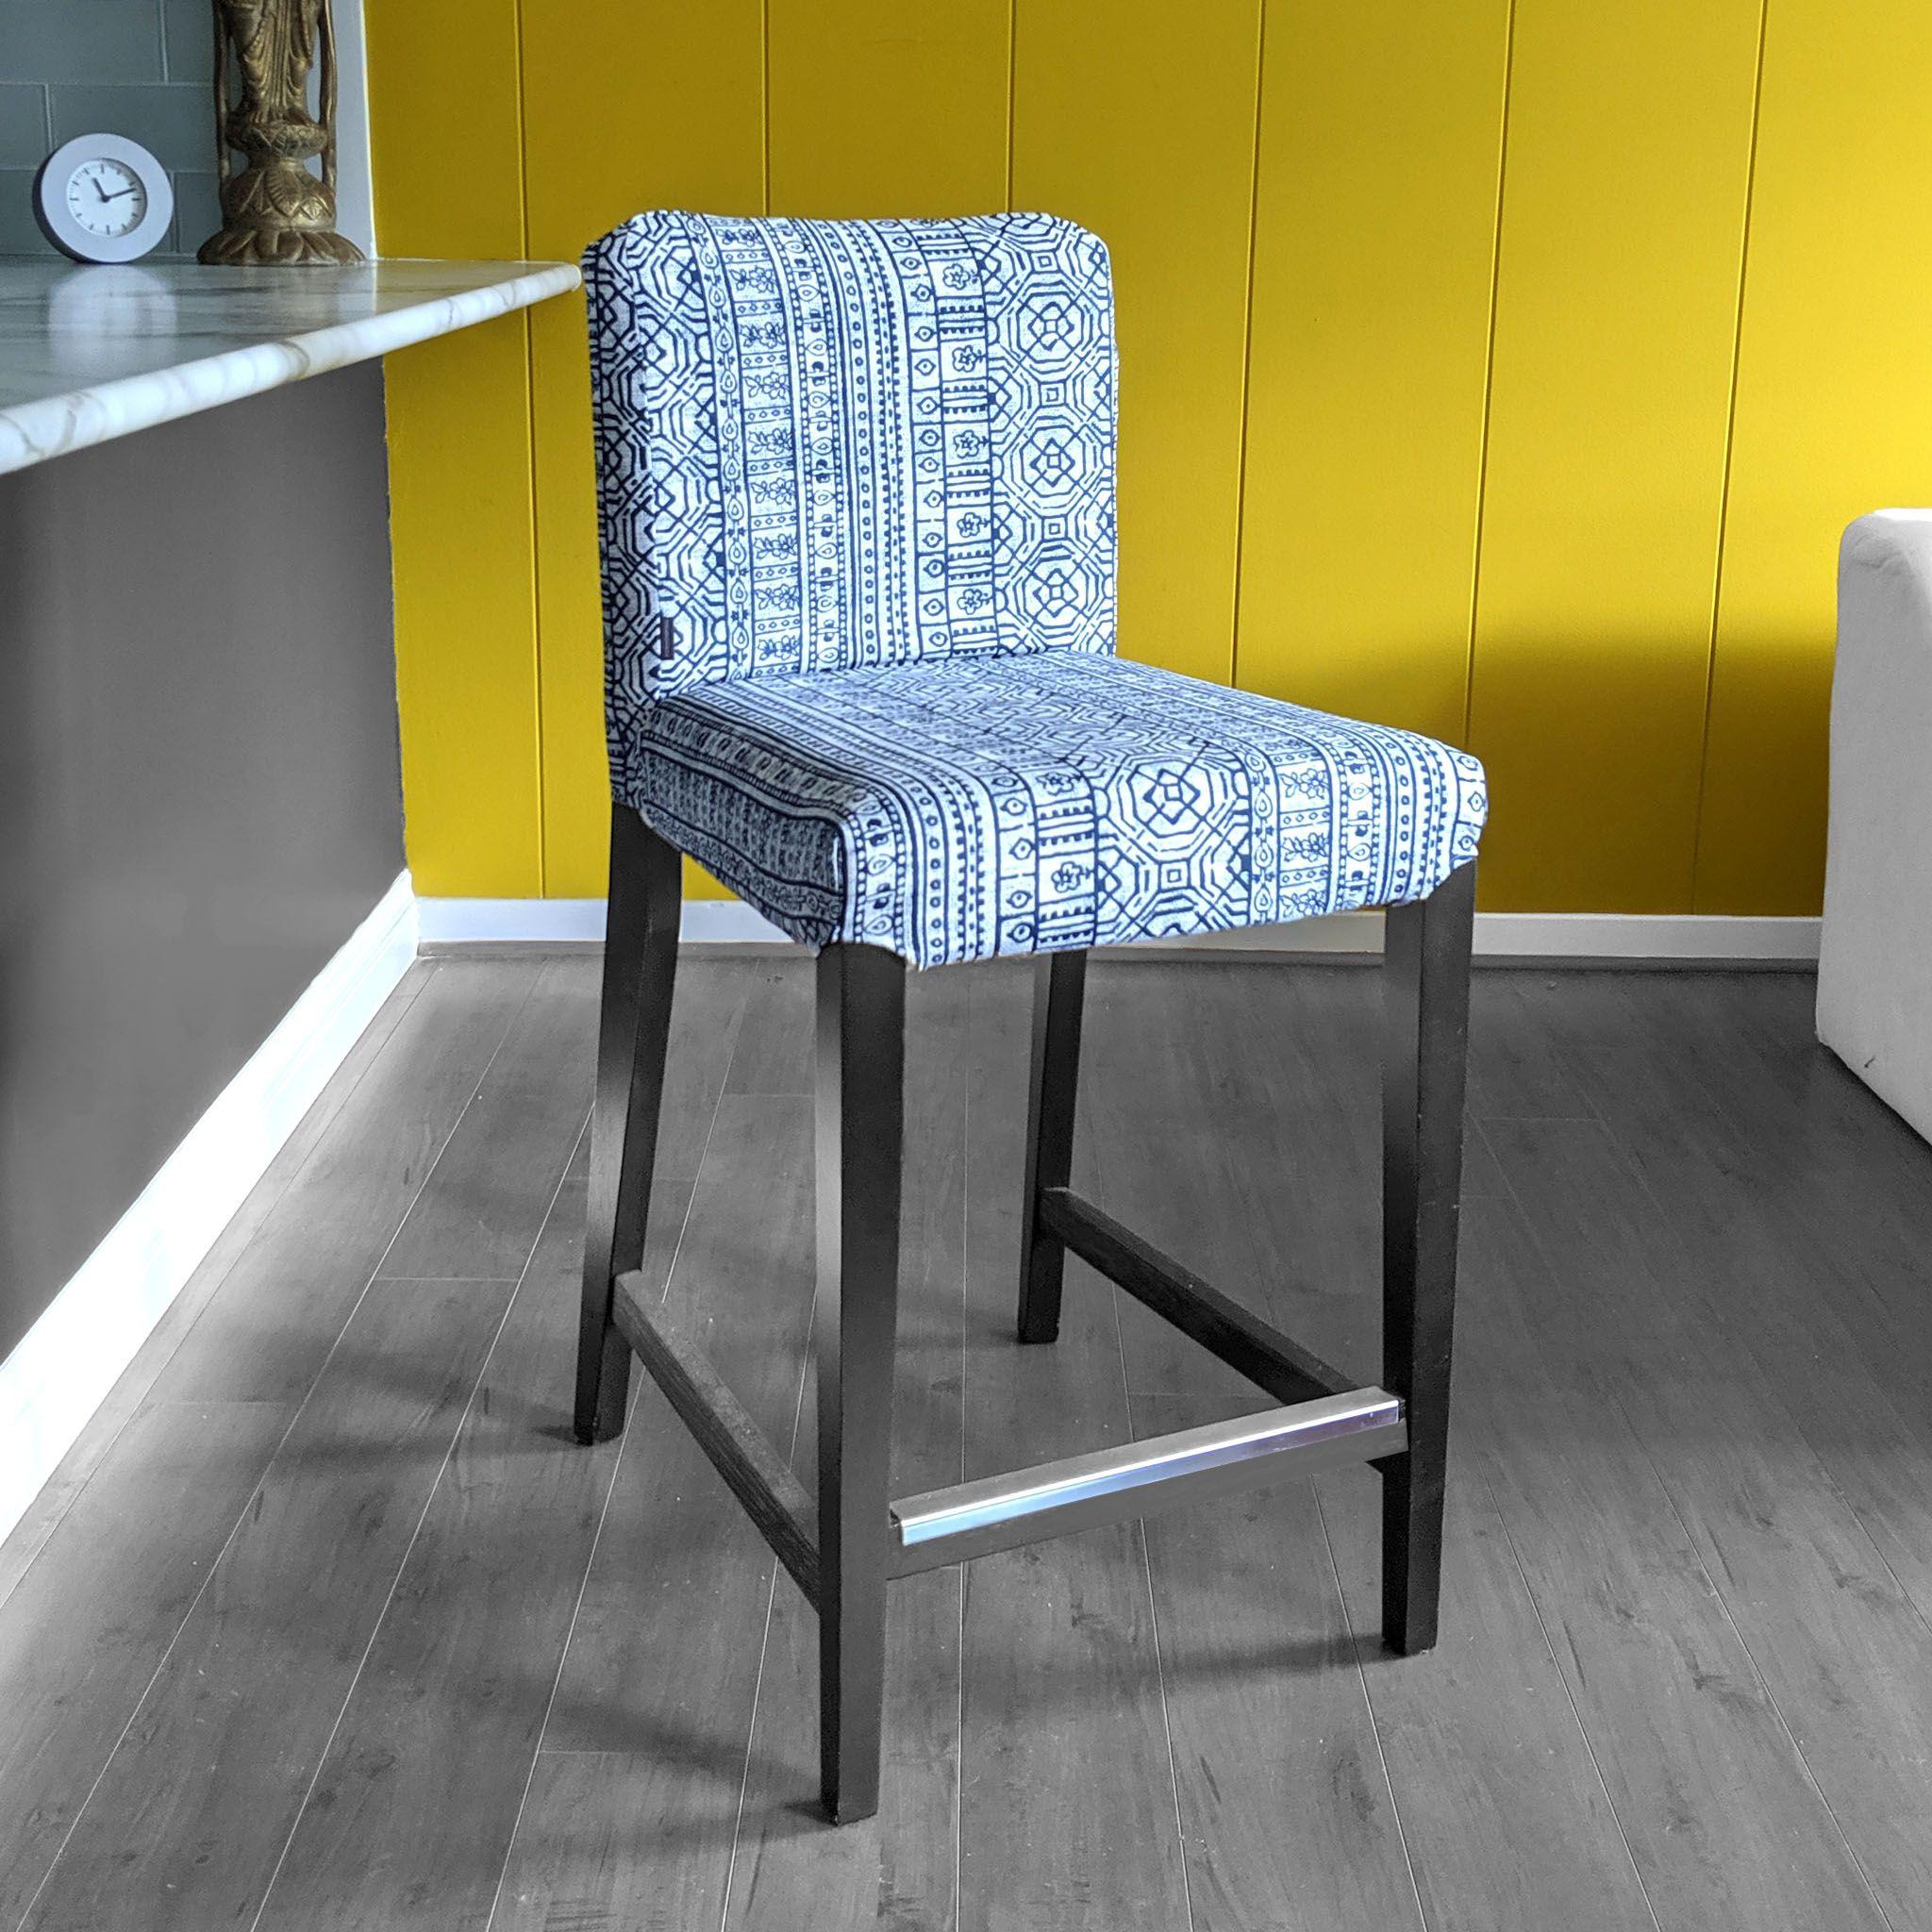 Ikea Henriksdal Bar Stool Chair Cover Navy Blue Tribal Print